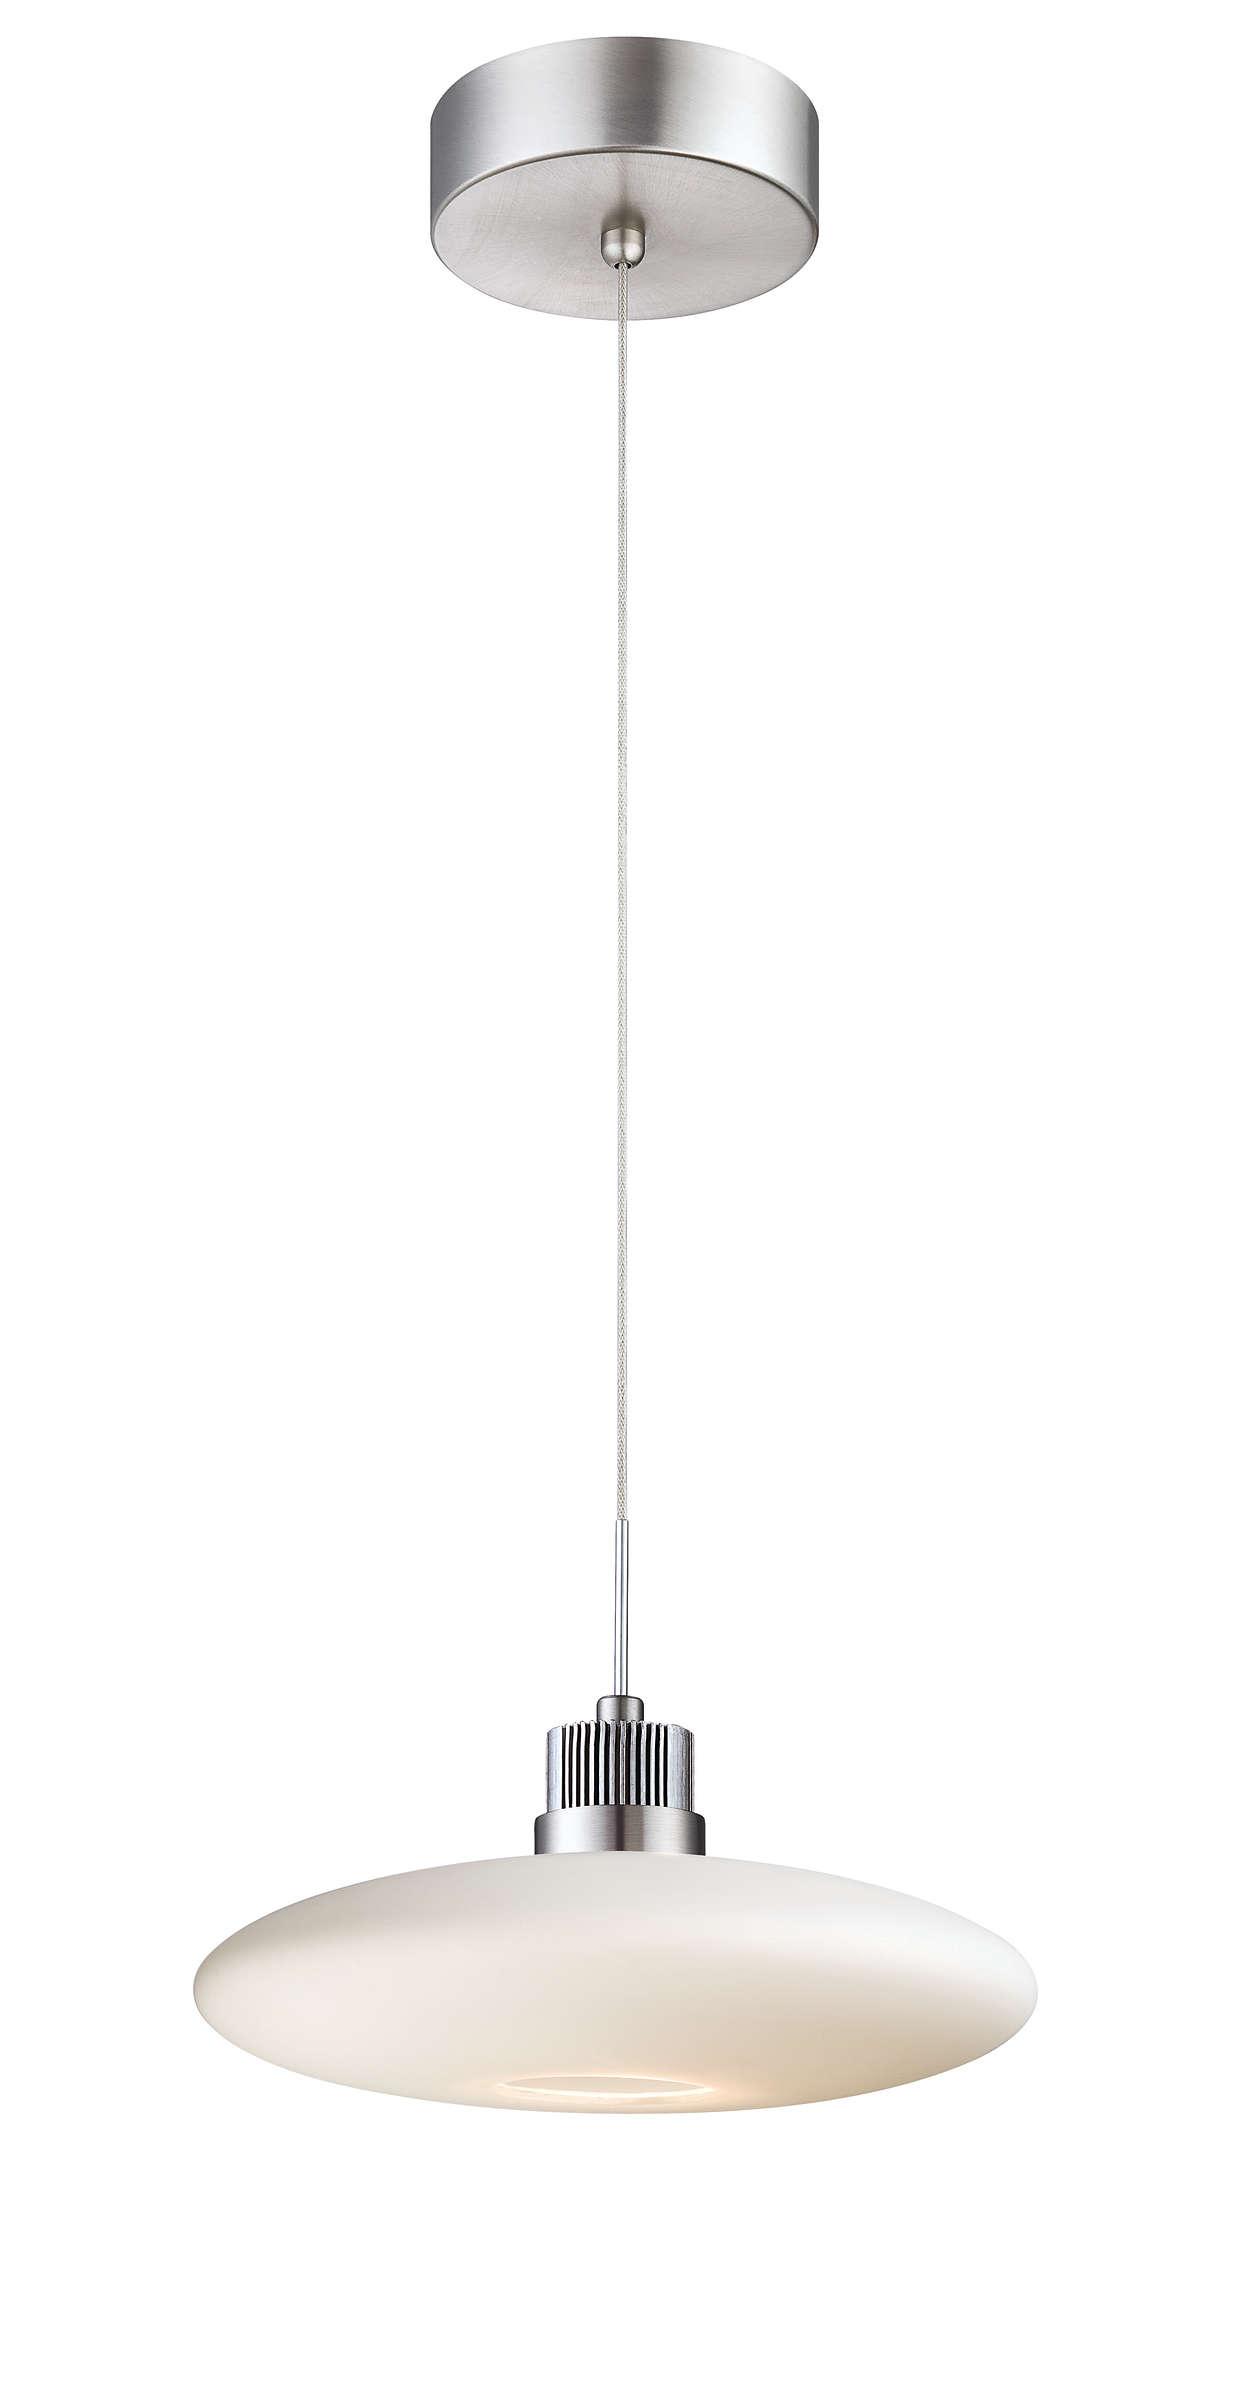 Wisp 1-light LED pendant in Satin Nickel finish